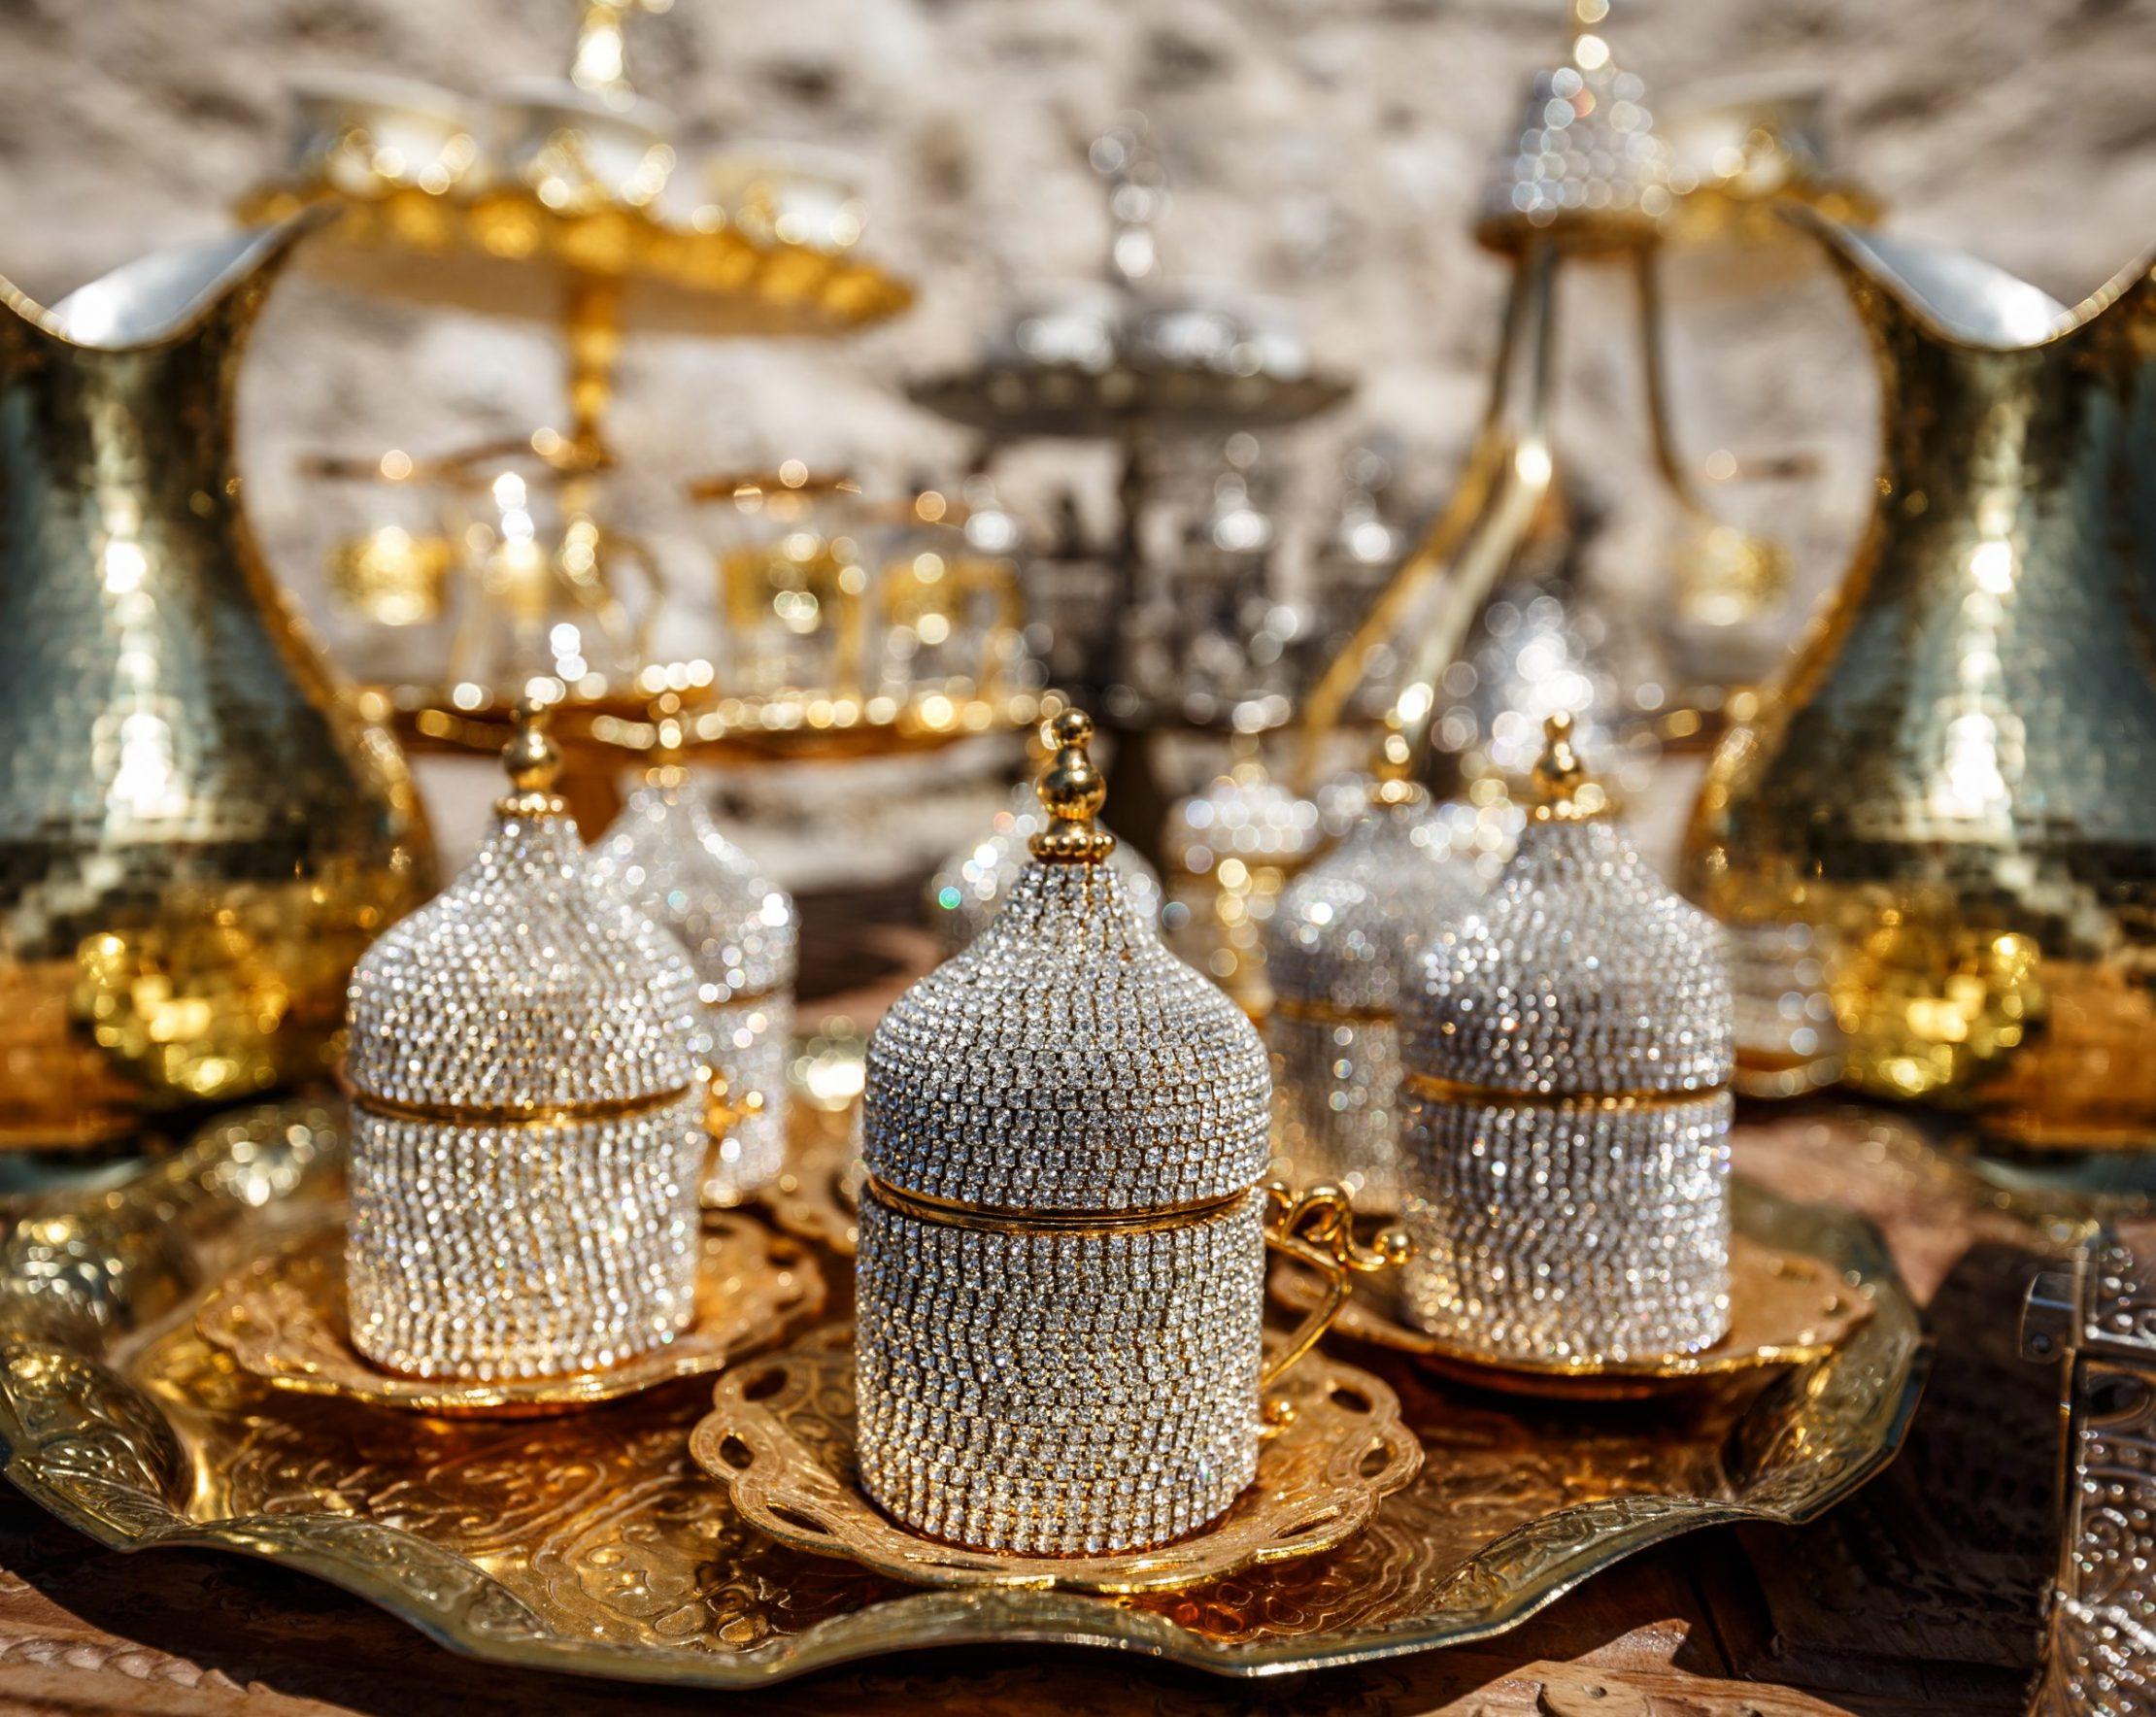 Ornamental Turkish coffee set